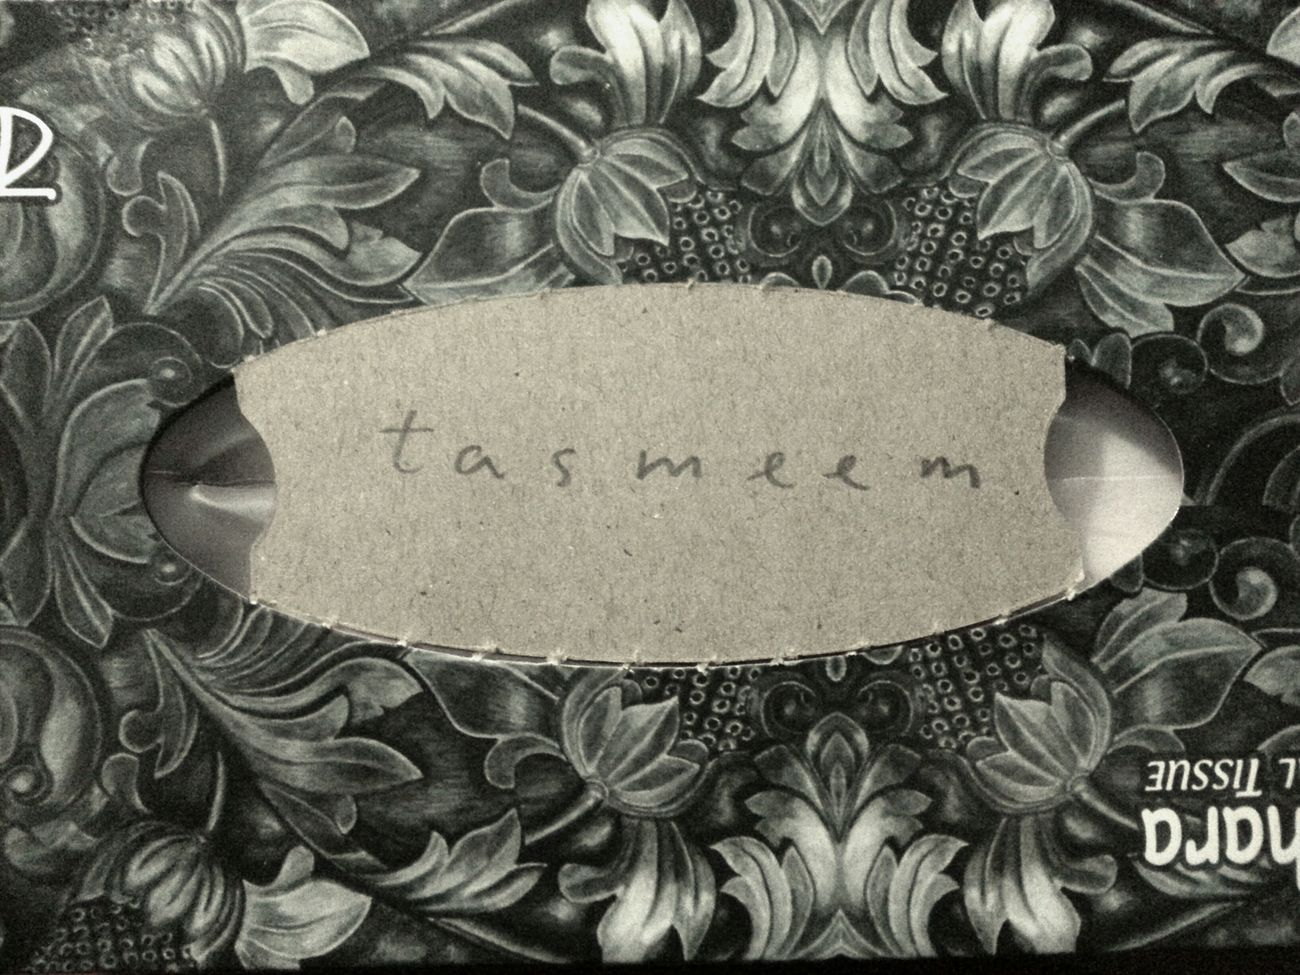 baba loves Tasmeem shob cheye beshi